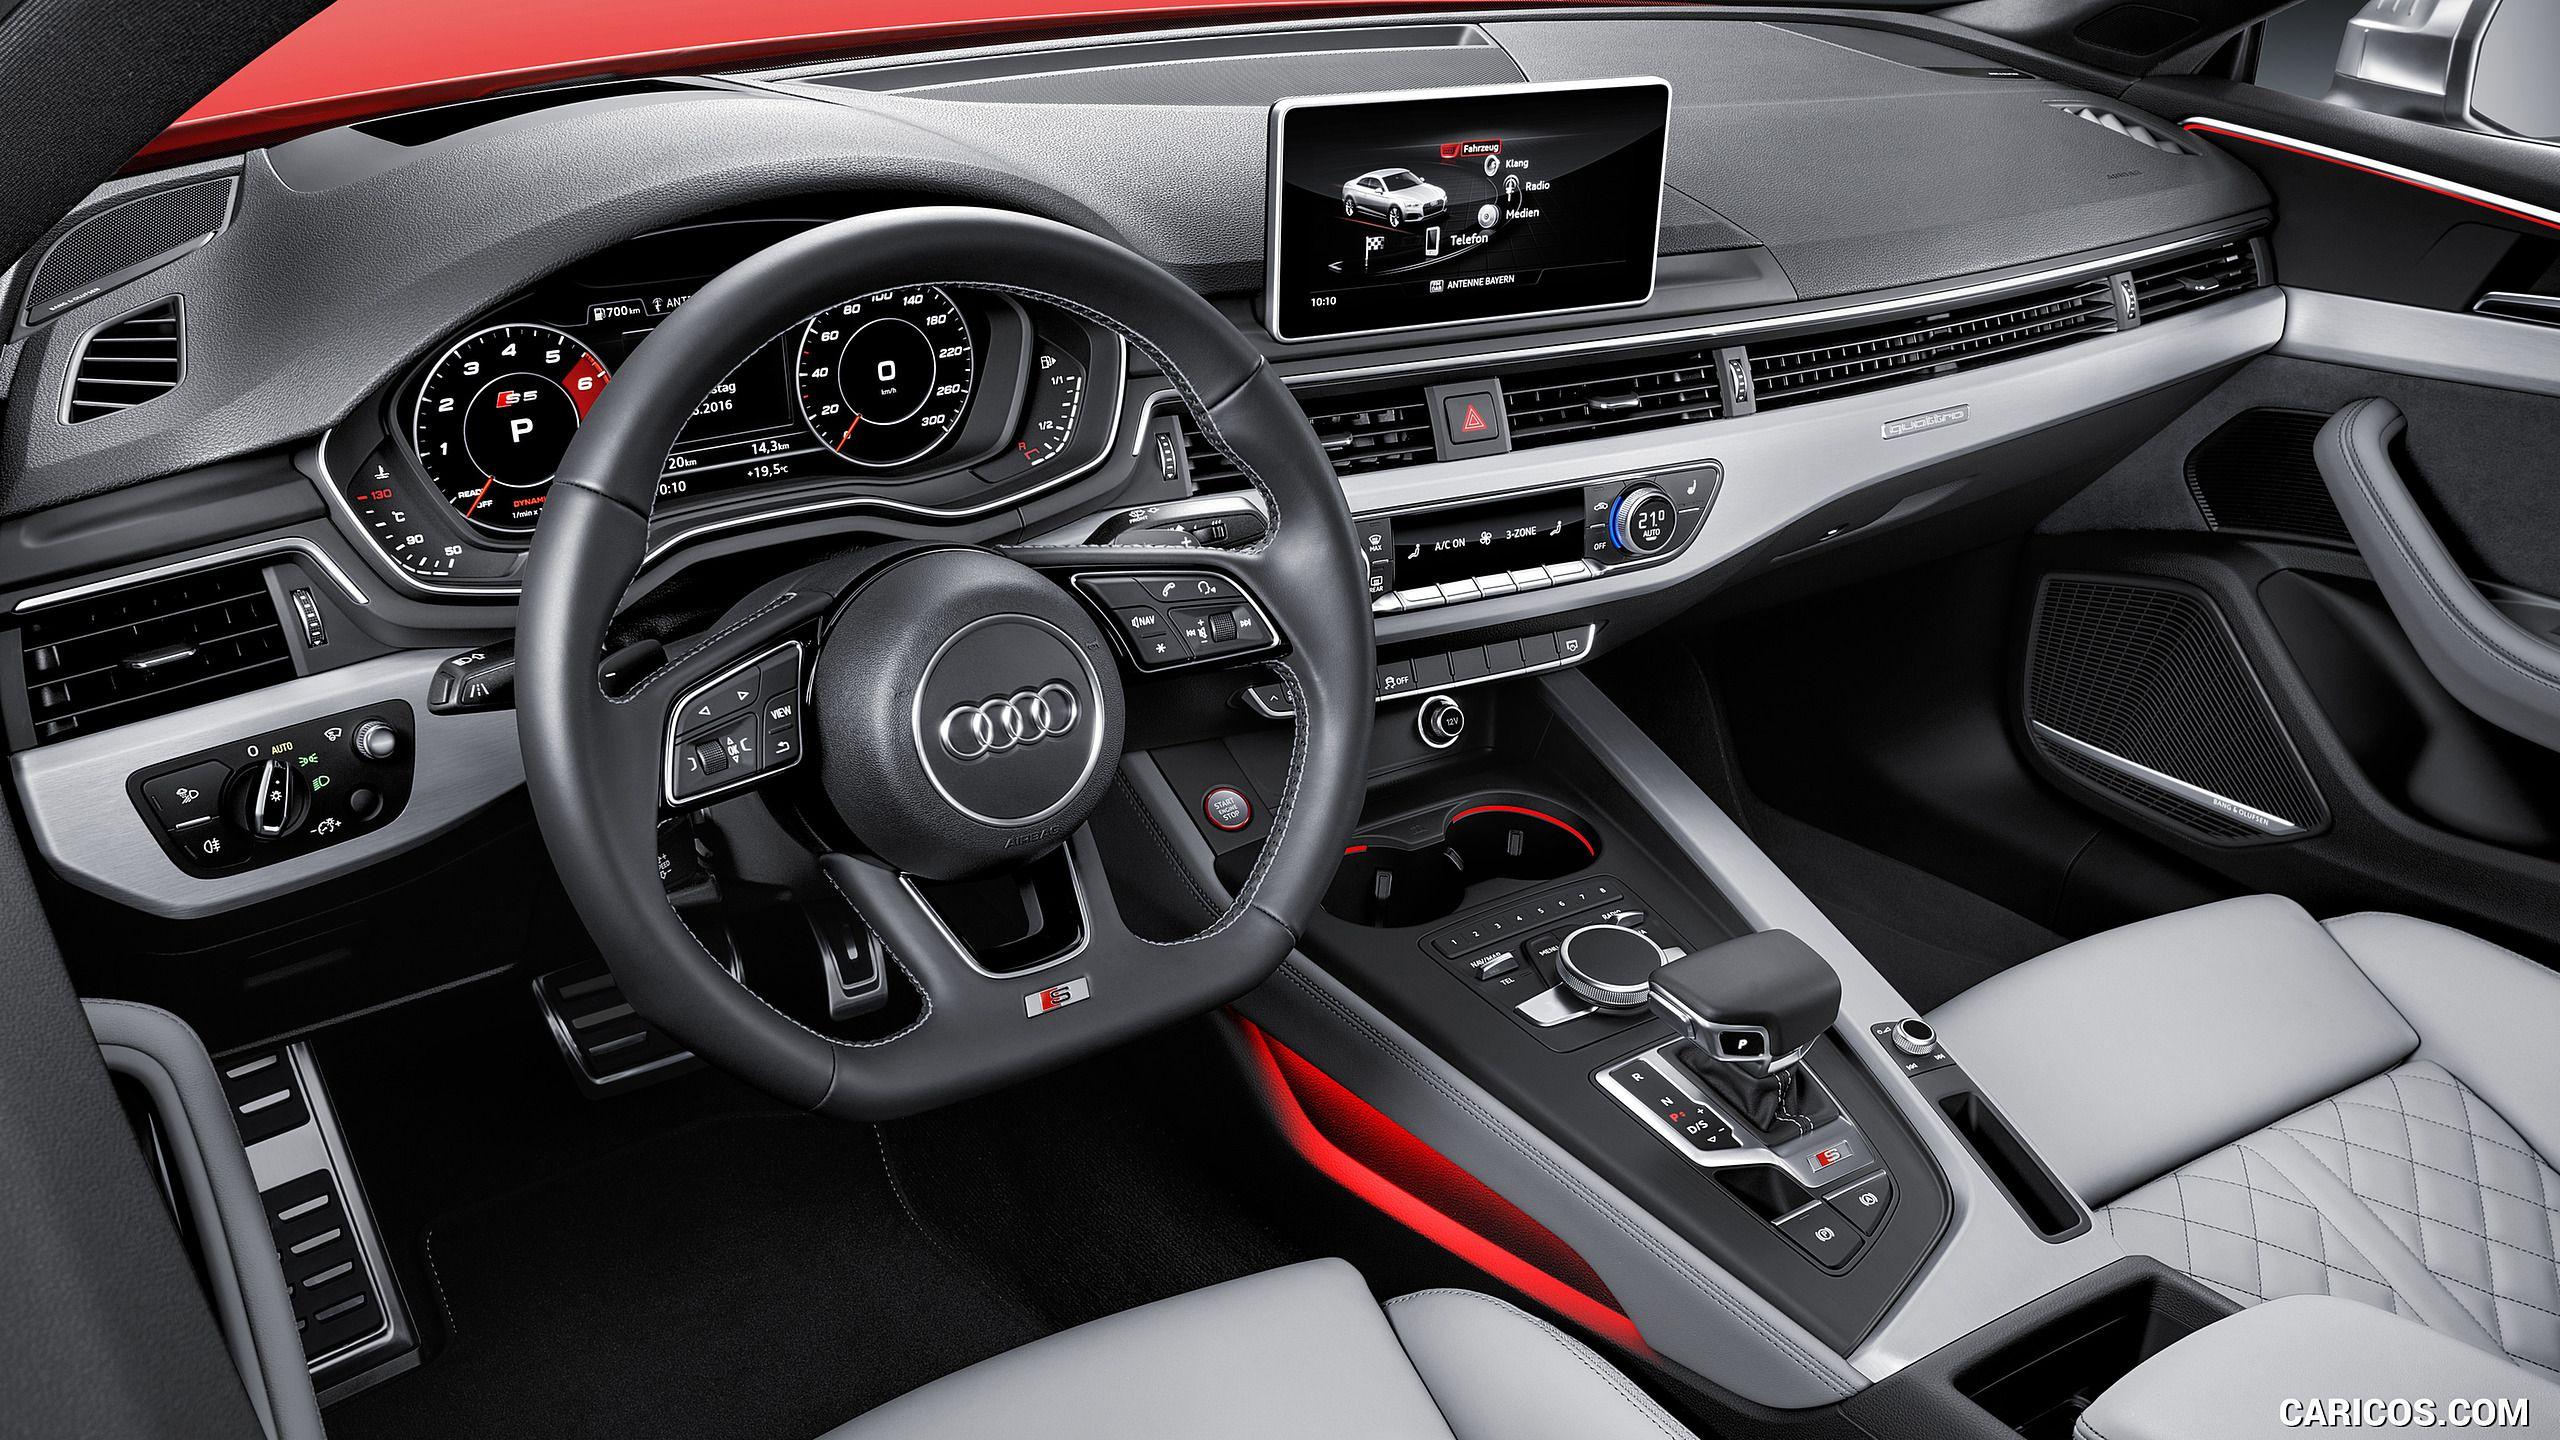 2018 Audi S5 Coupe Interior Hd Audi A5 Interior Audi A5 Coupe Audi S5